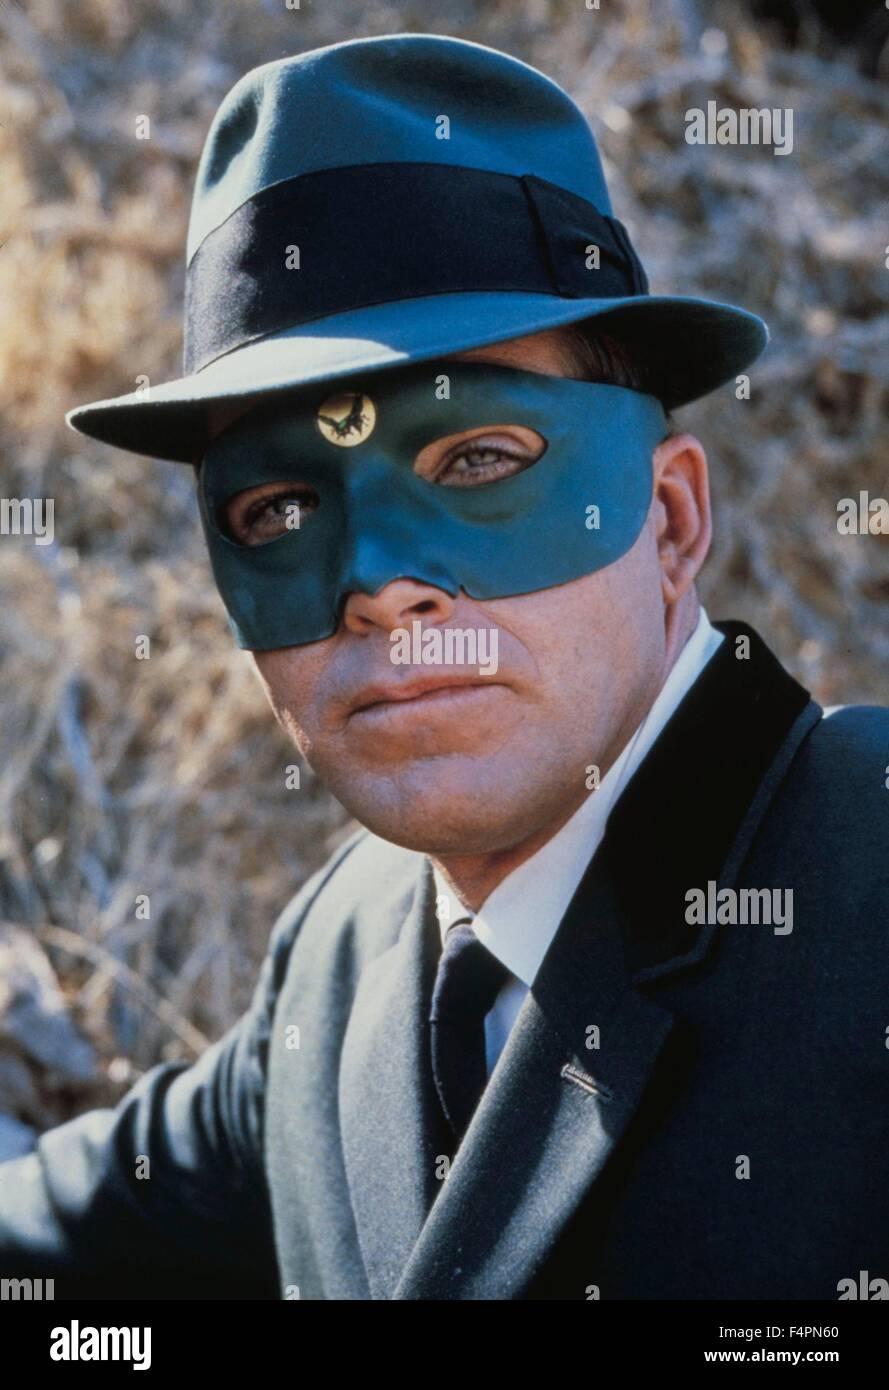 Van Williams / The Green Hornet (TV Series) / 1966-1967 created by  George W. Trendle [Twentieth Century Fox Television] - Stock Image